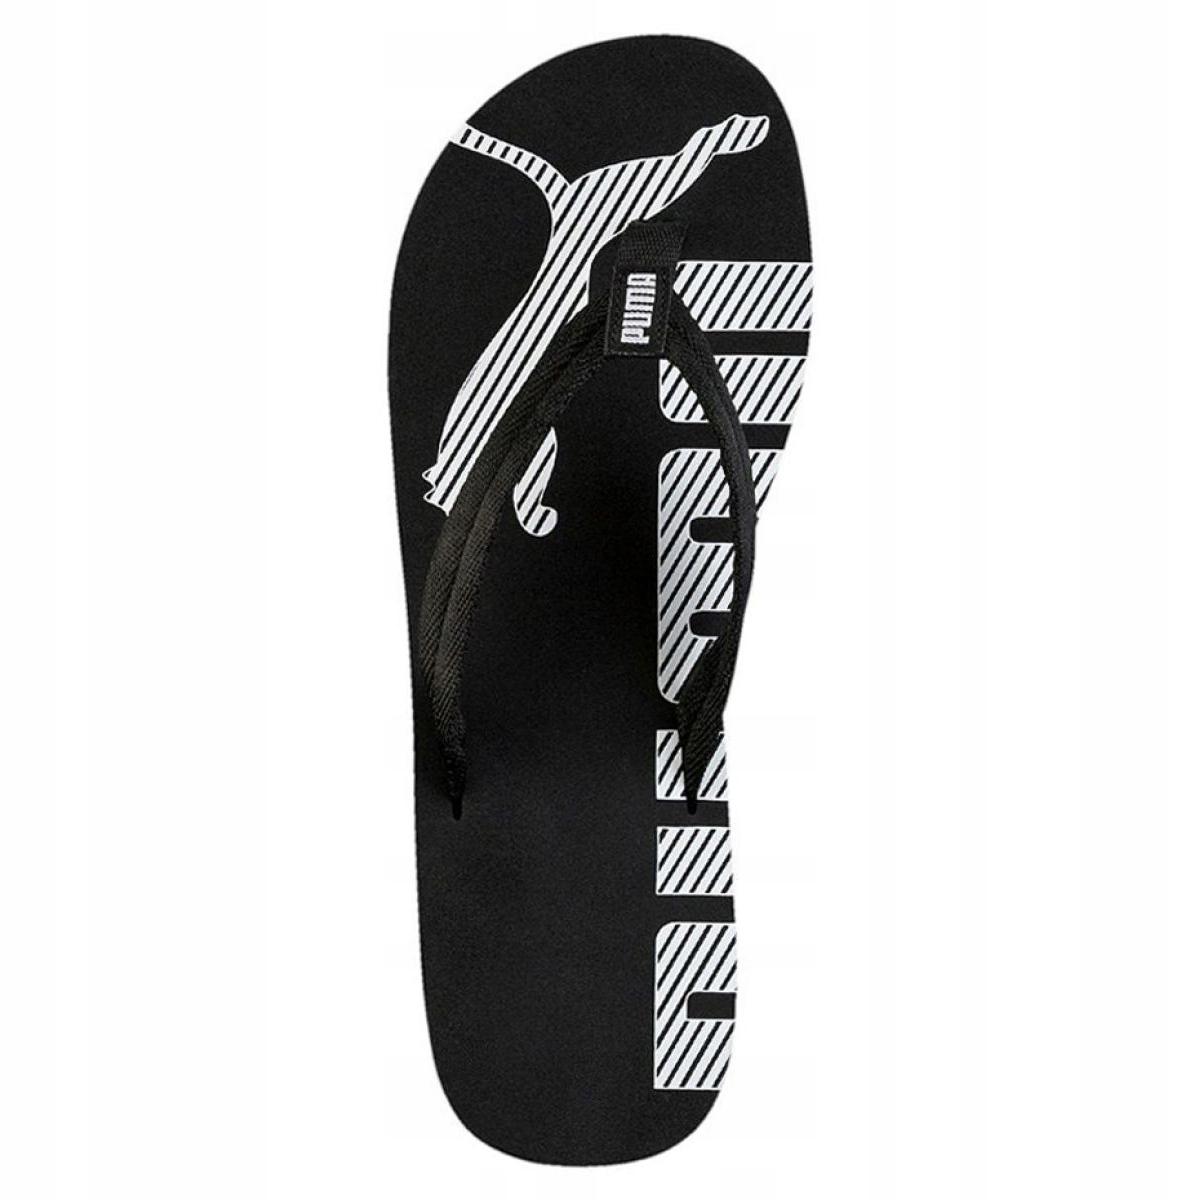 compra genuina zapatillas de skate acogedor fresco Chanclas Puma Epic Flip V2 M 360248 03 negro